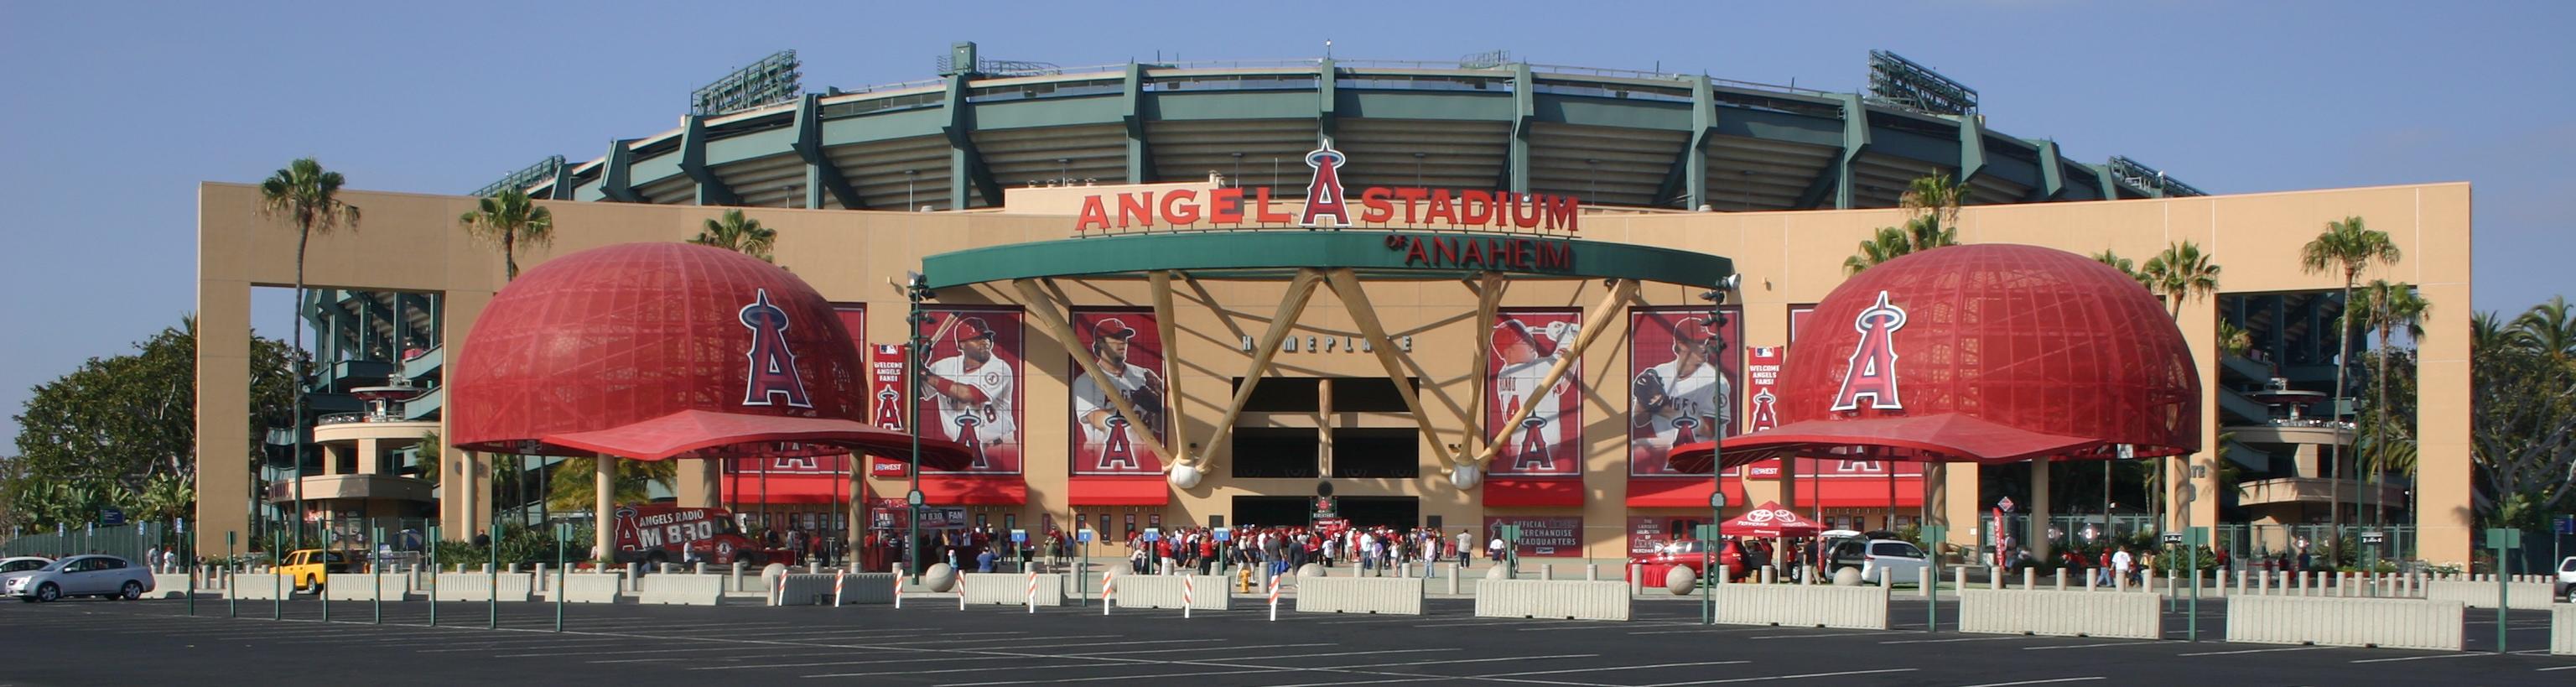 Angel Stadium,West Coast Baseball Tour,Baseball Road Trip